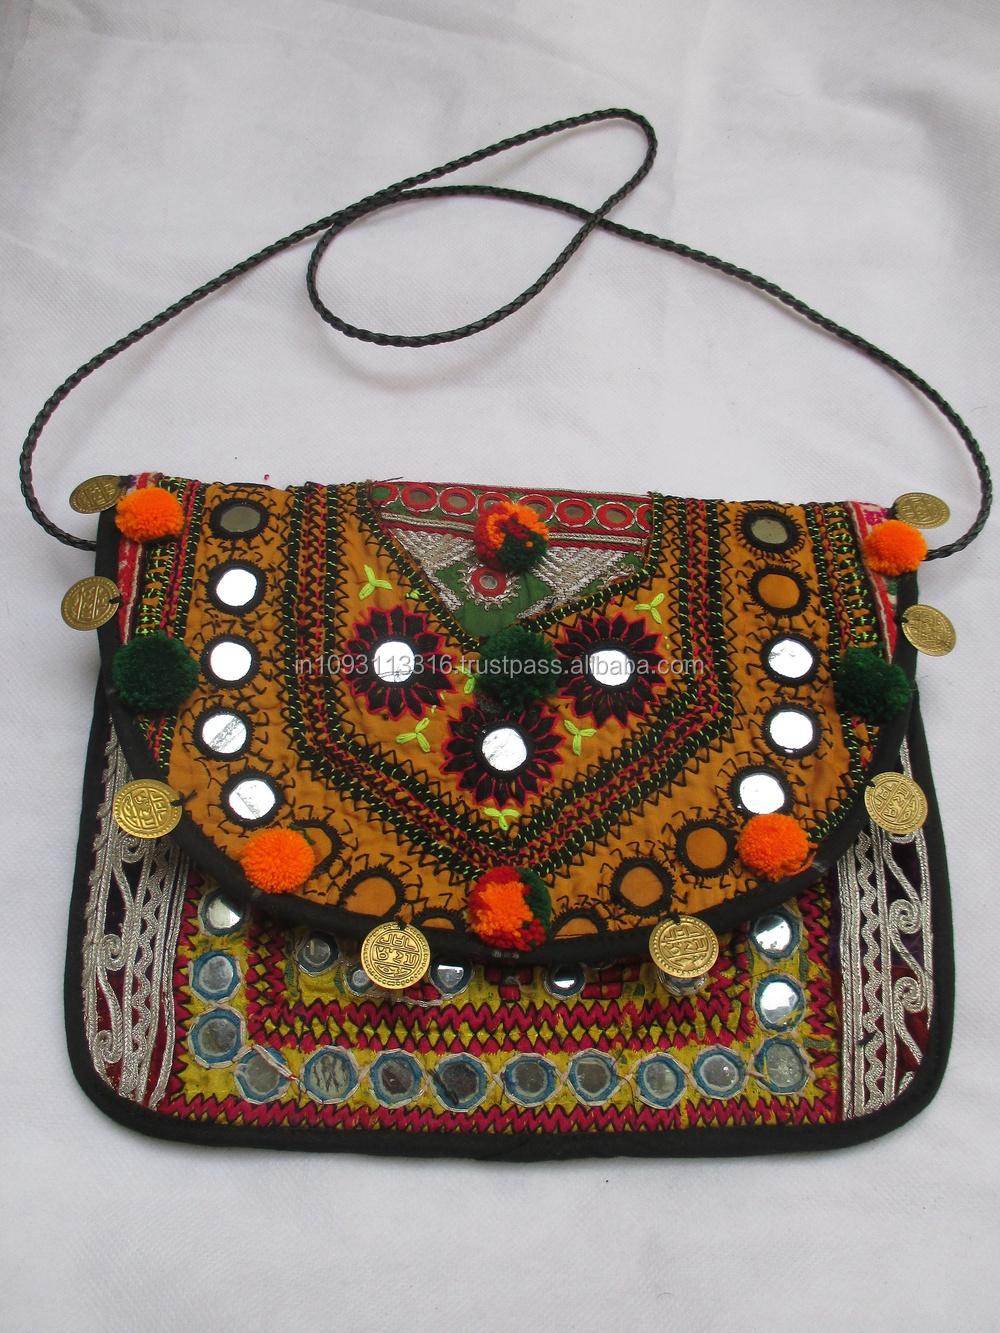 New Hand Embroidered Mirror Work Bag Vintage Banjara Ethnic Boho